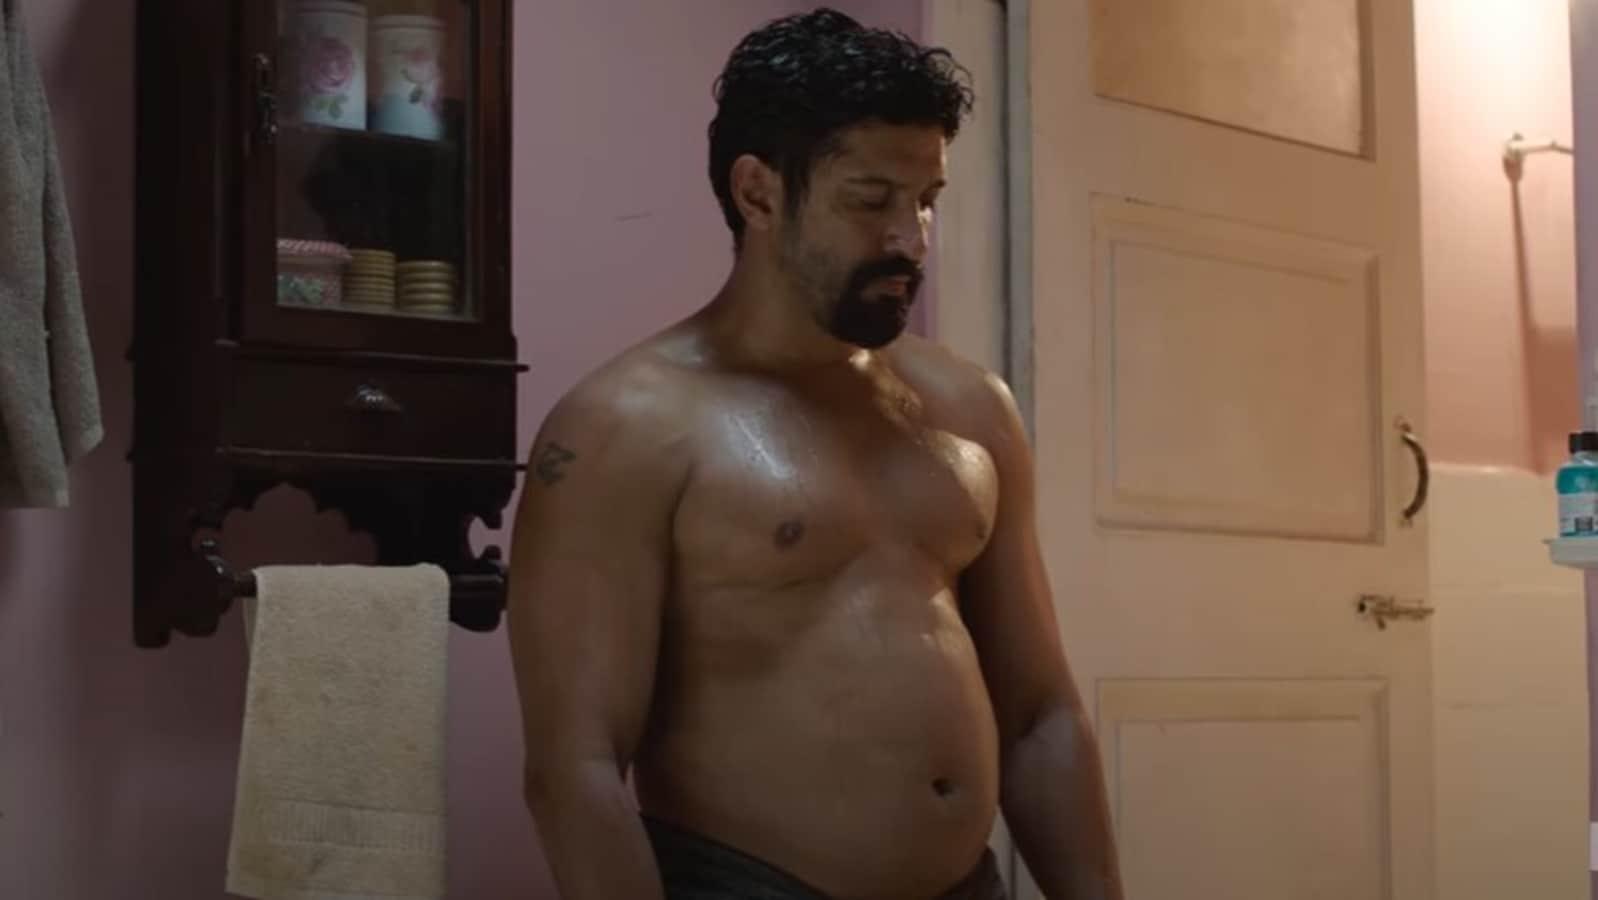 Toofaan trailer: Farhan Akhtar packs a punch as disgraced boxer who makes  triumphant comeback, watch   Bollywood - Hindustan Times